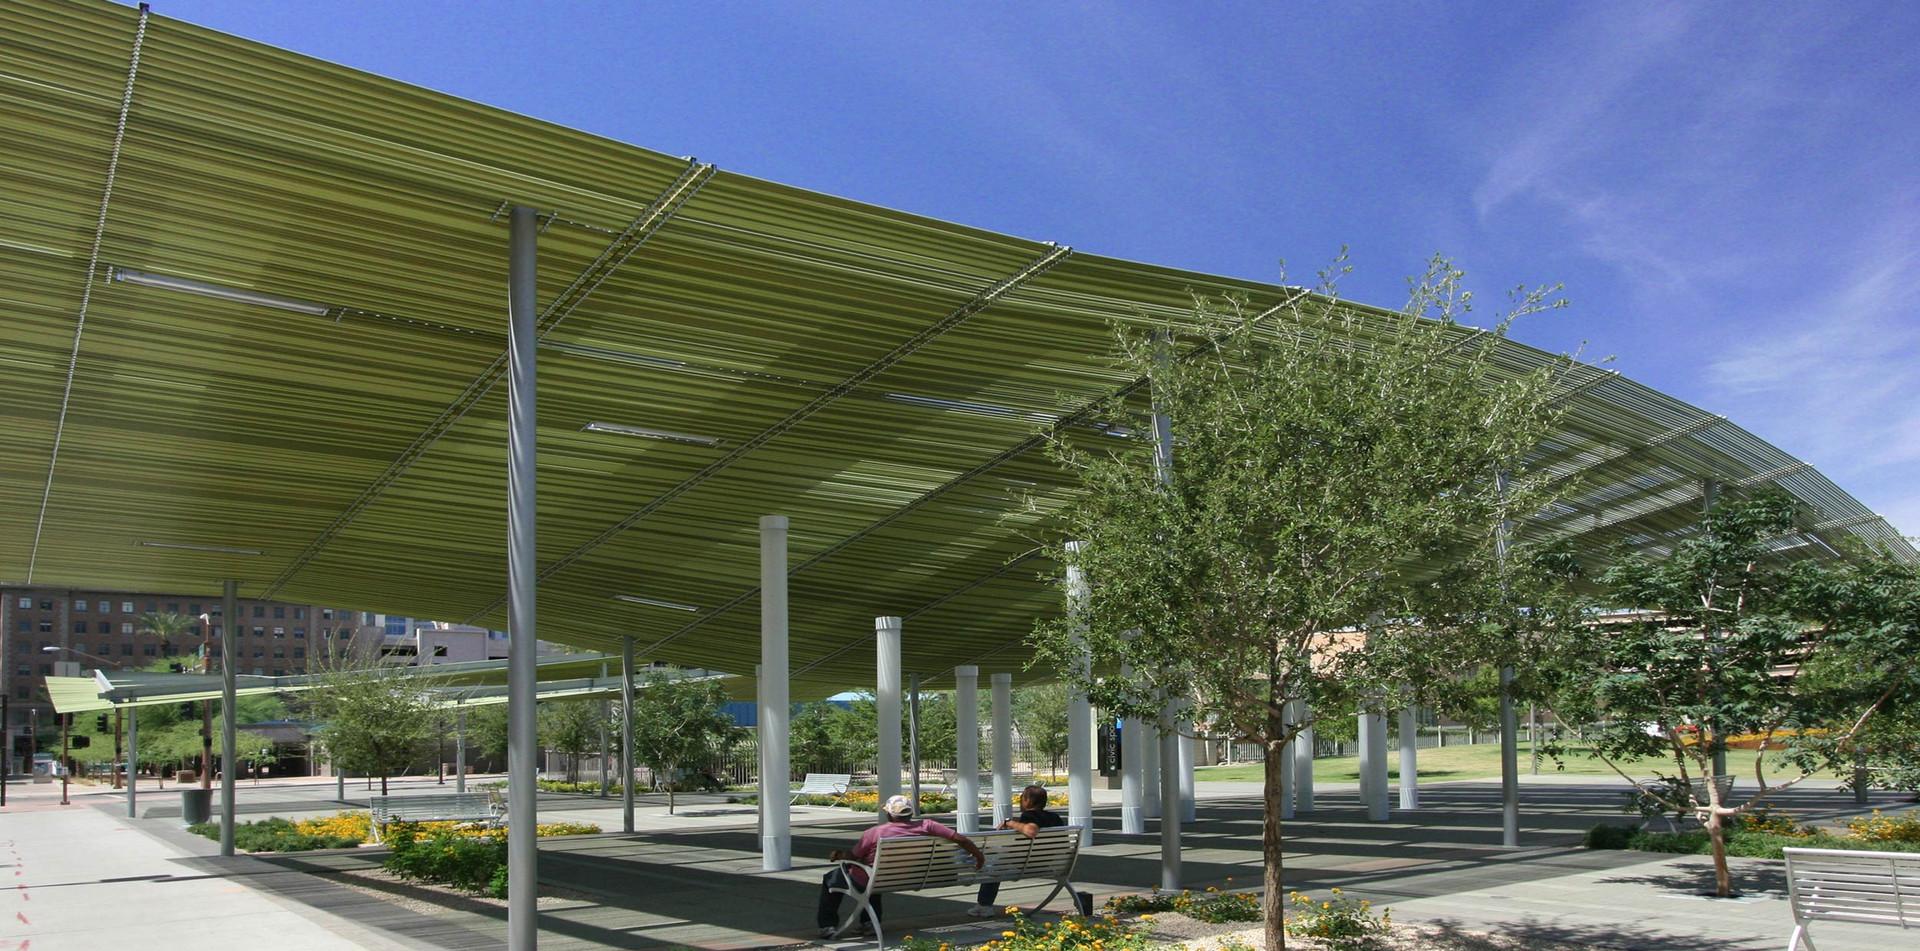 Phoenix Civic Space Canopies